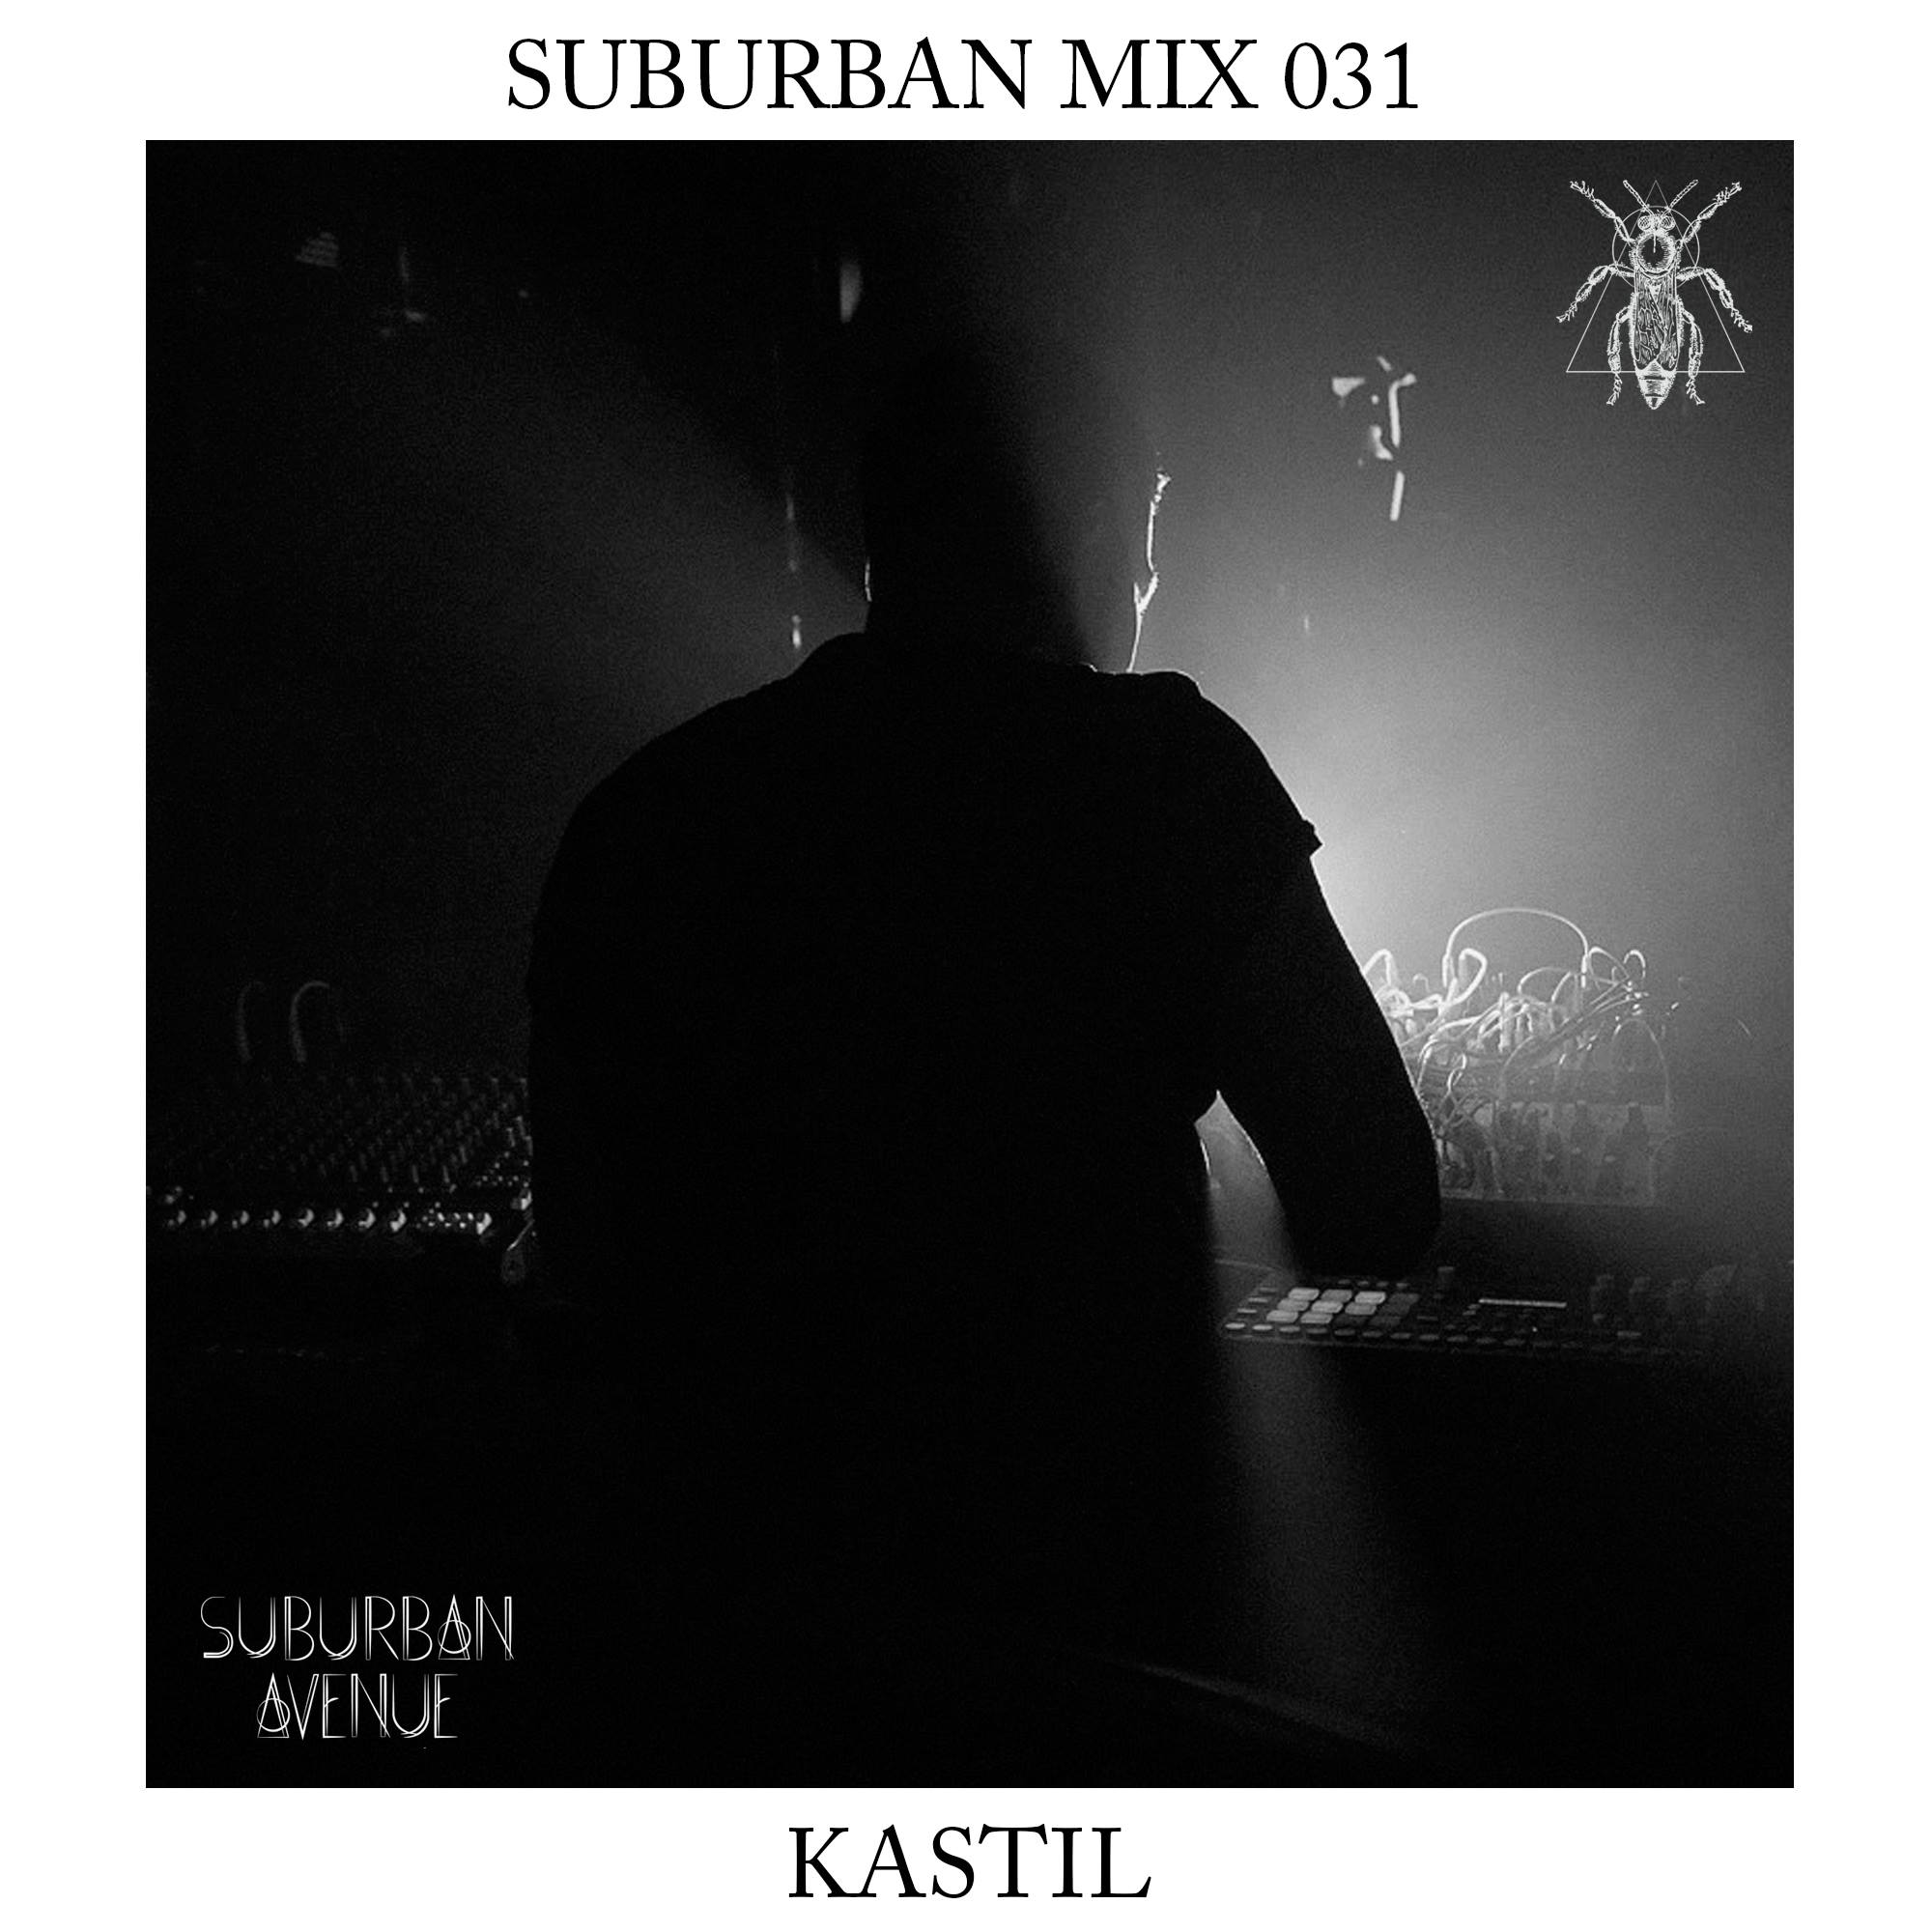 Suburban Mix 031 - Kastil